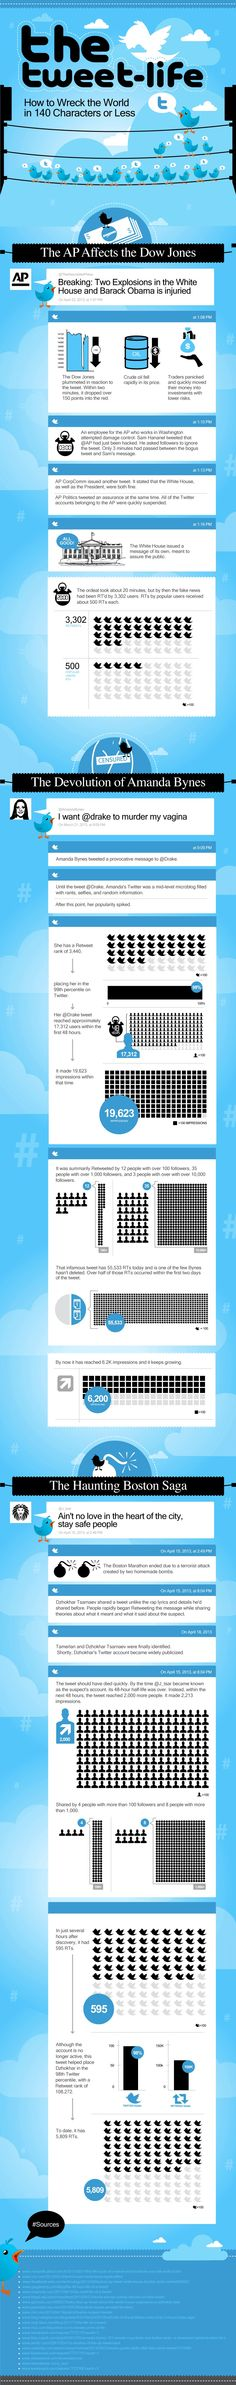 The Tweet Life [INFOGRAPHIC] - Social Media Explorer | #TheMarketingAutomationAlert